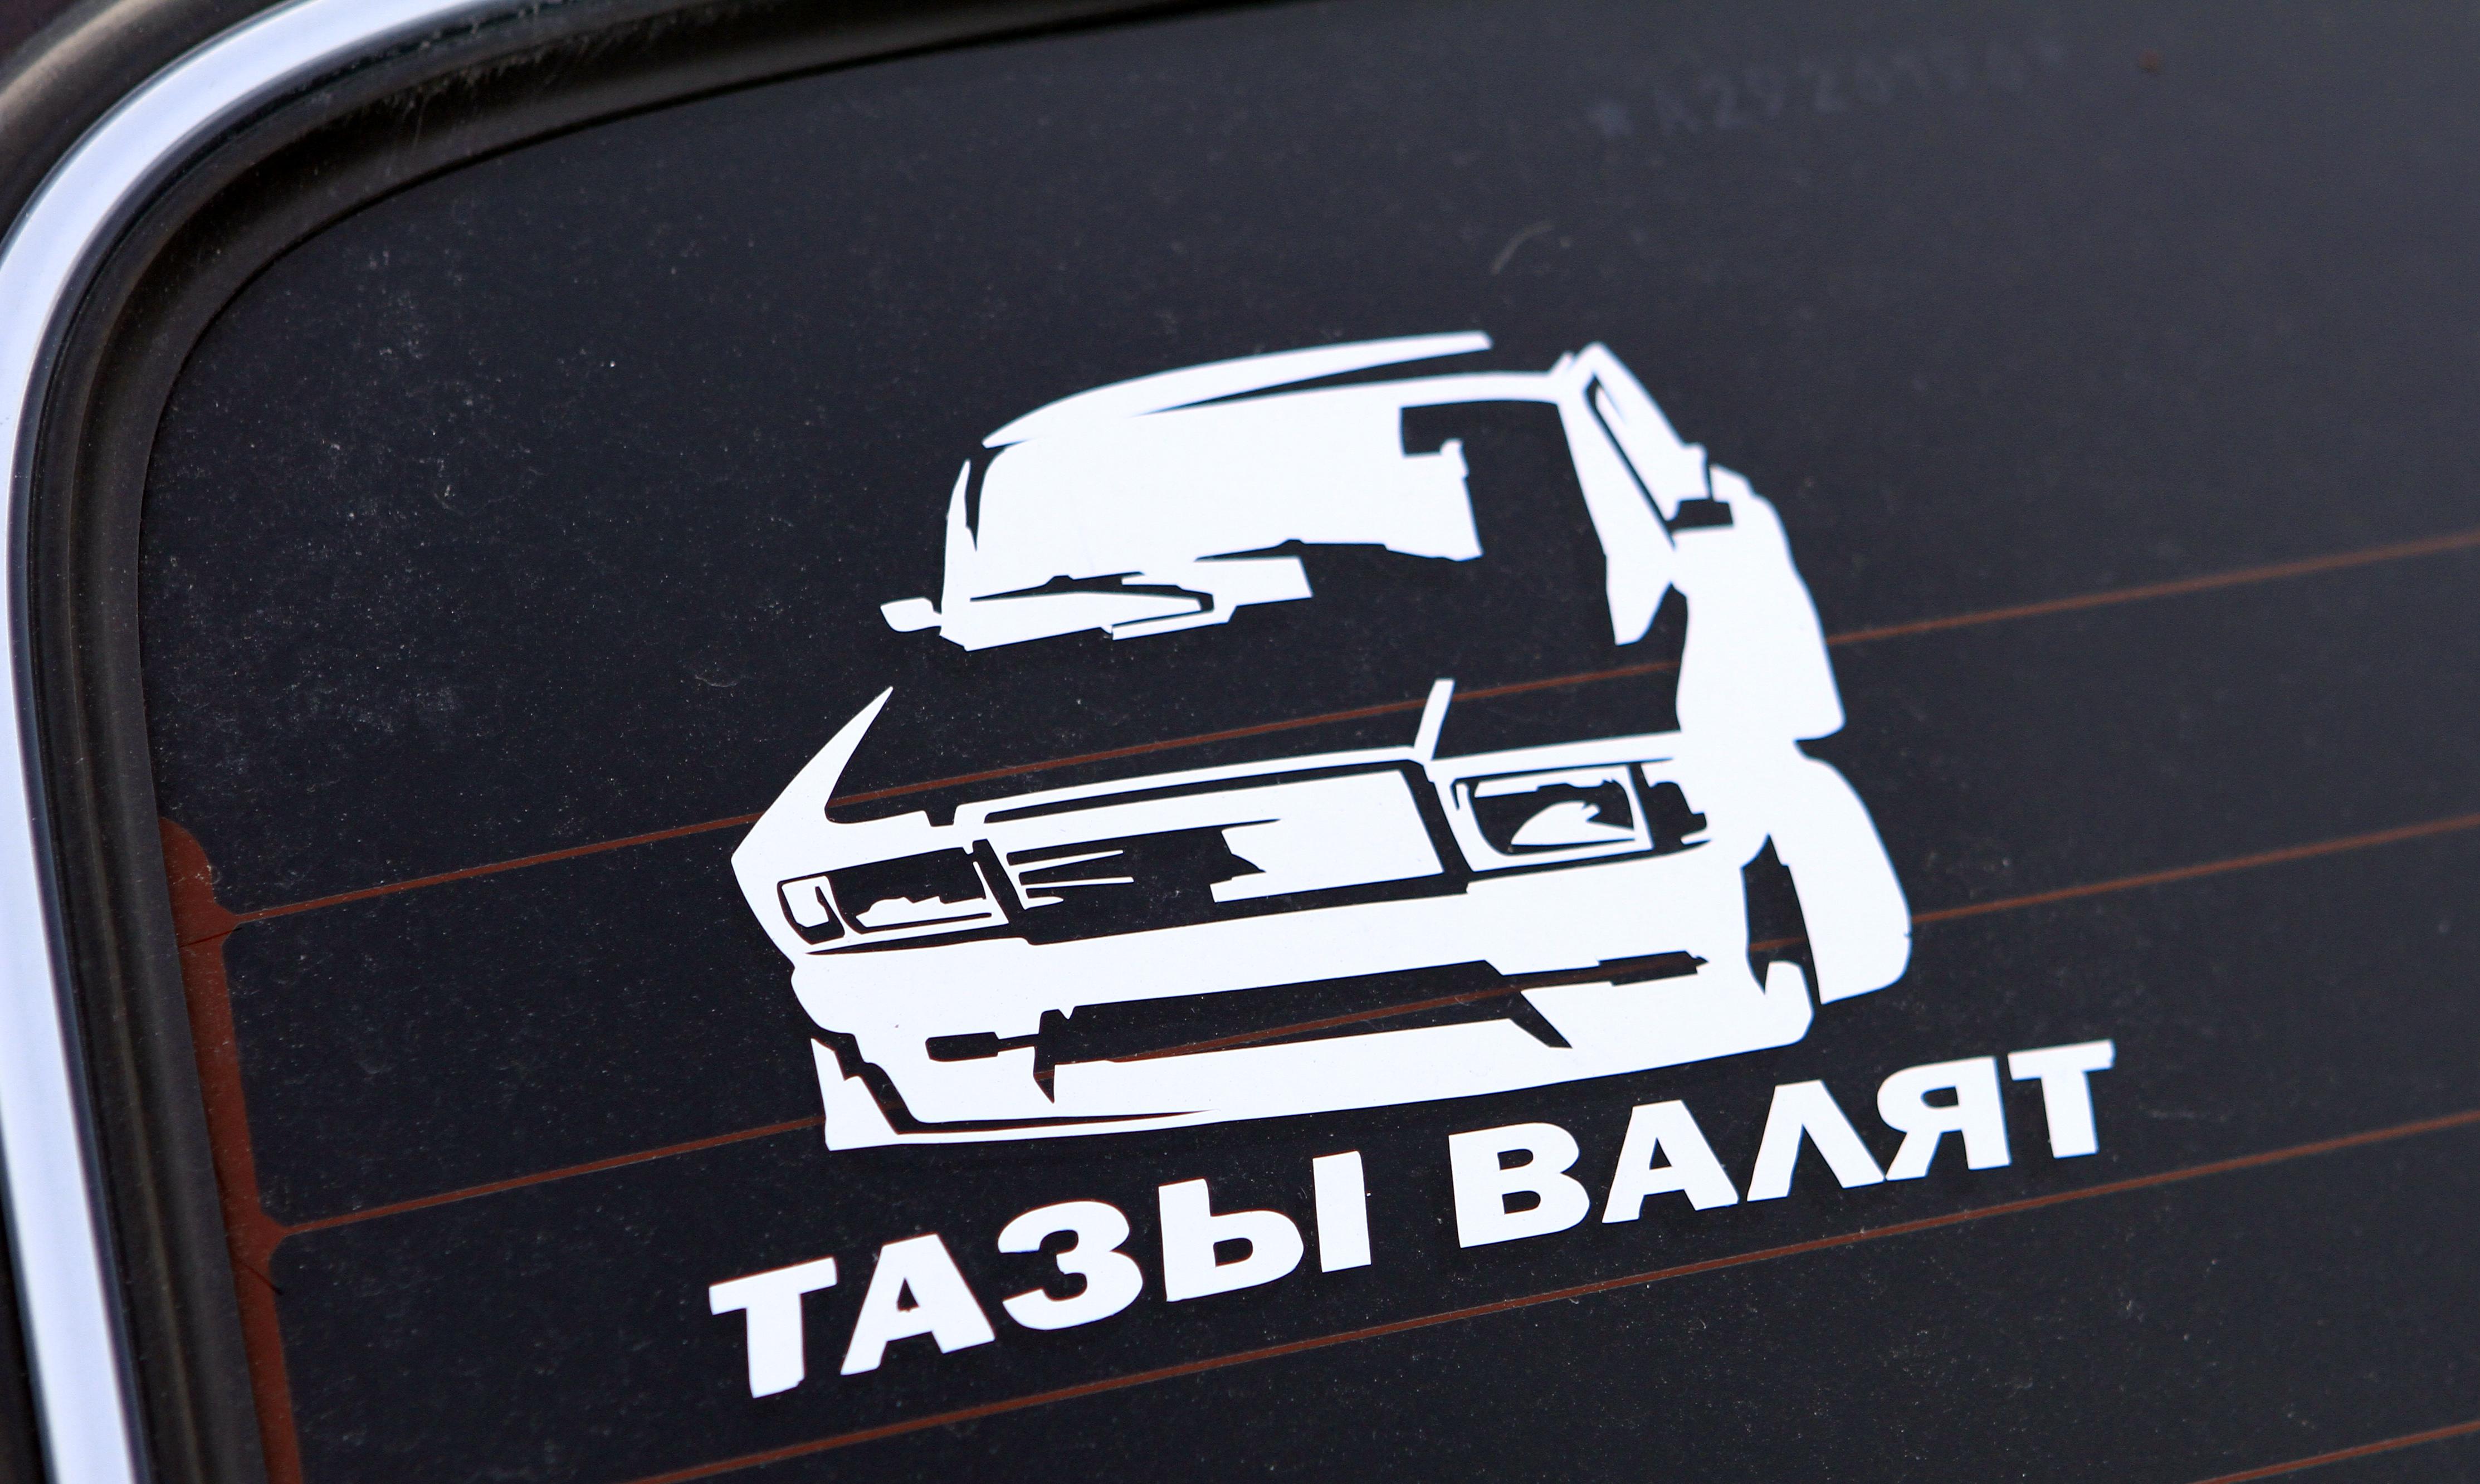 Екатеринбургу показали суперкары. Целых два